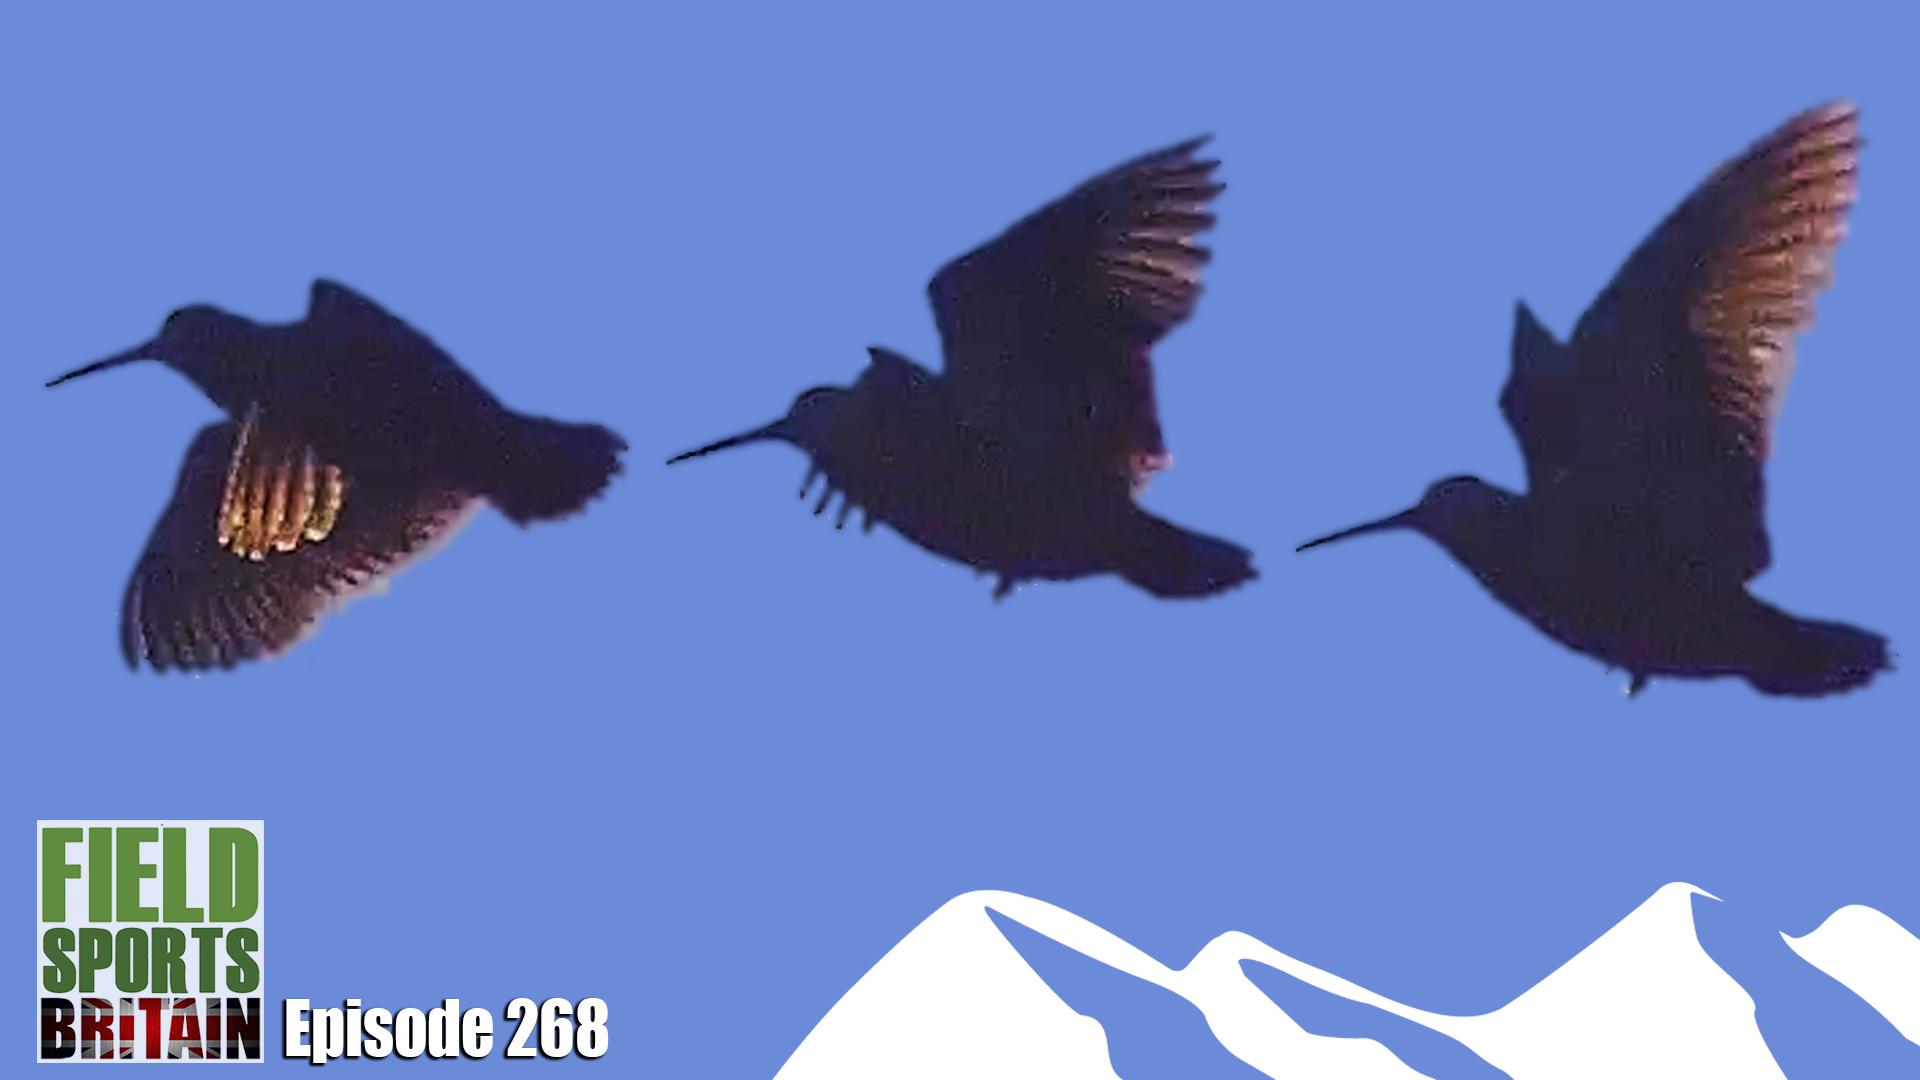 e368-preview-image